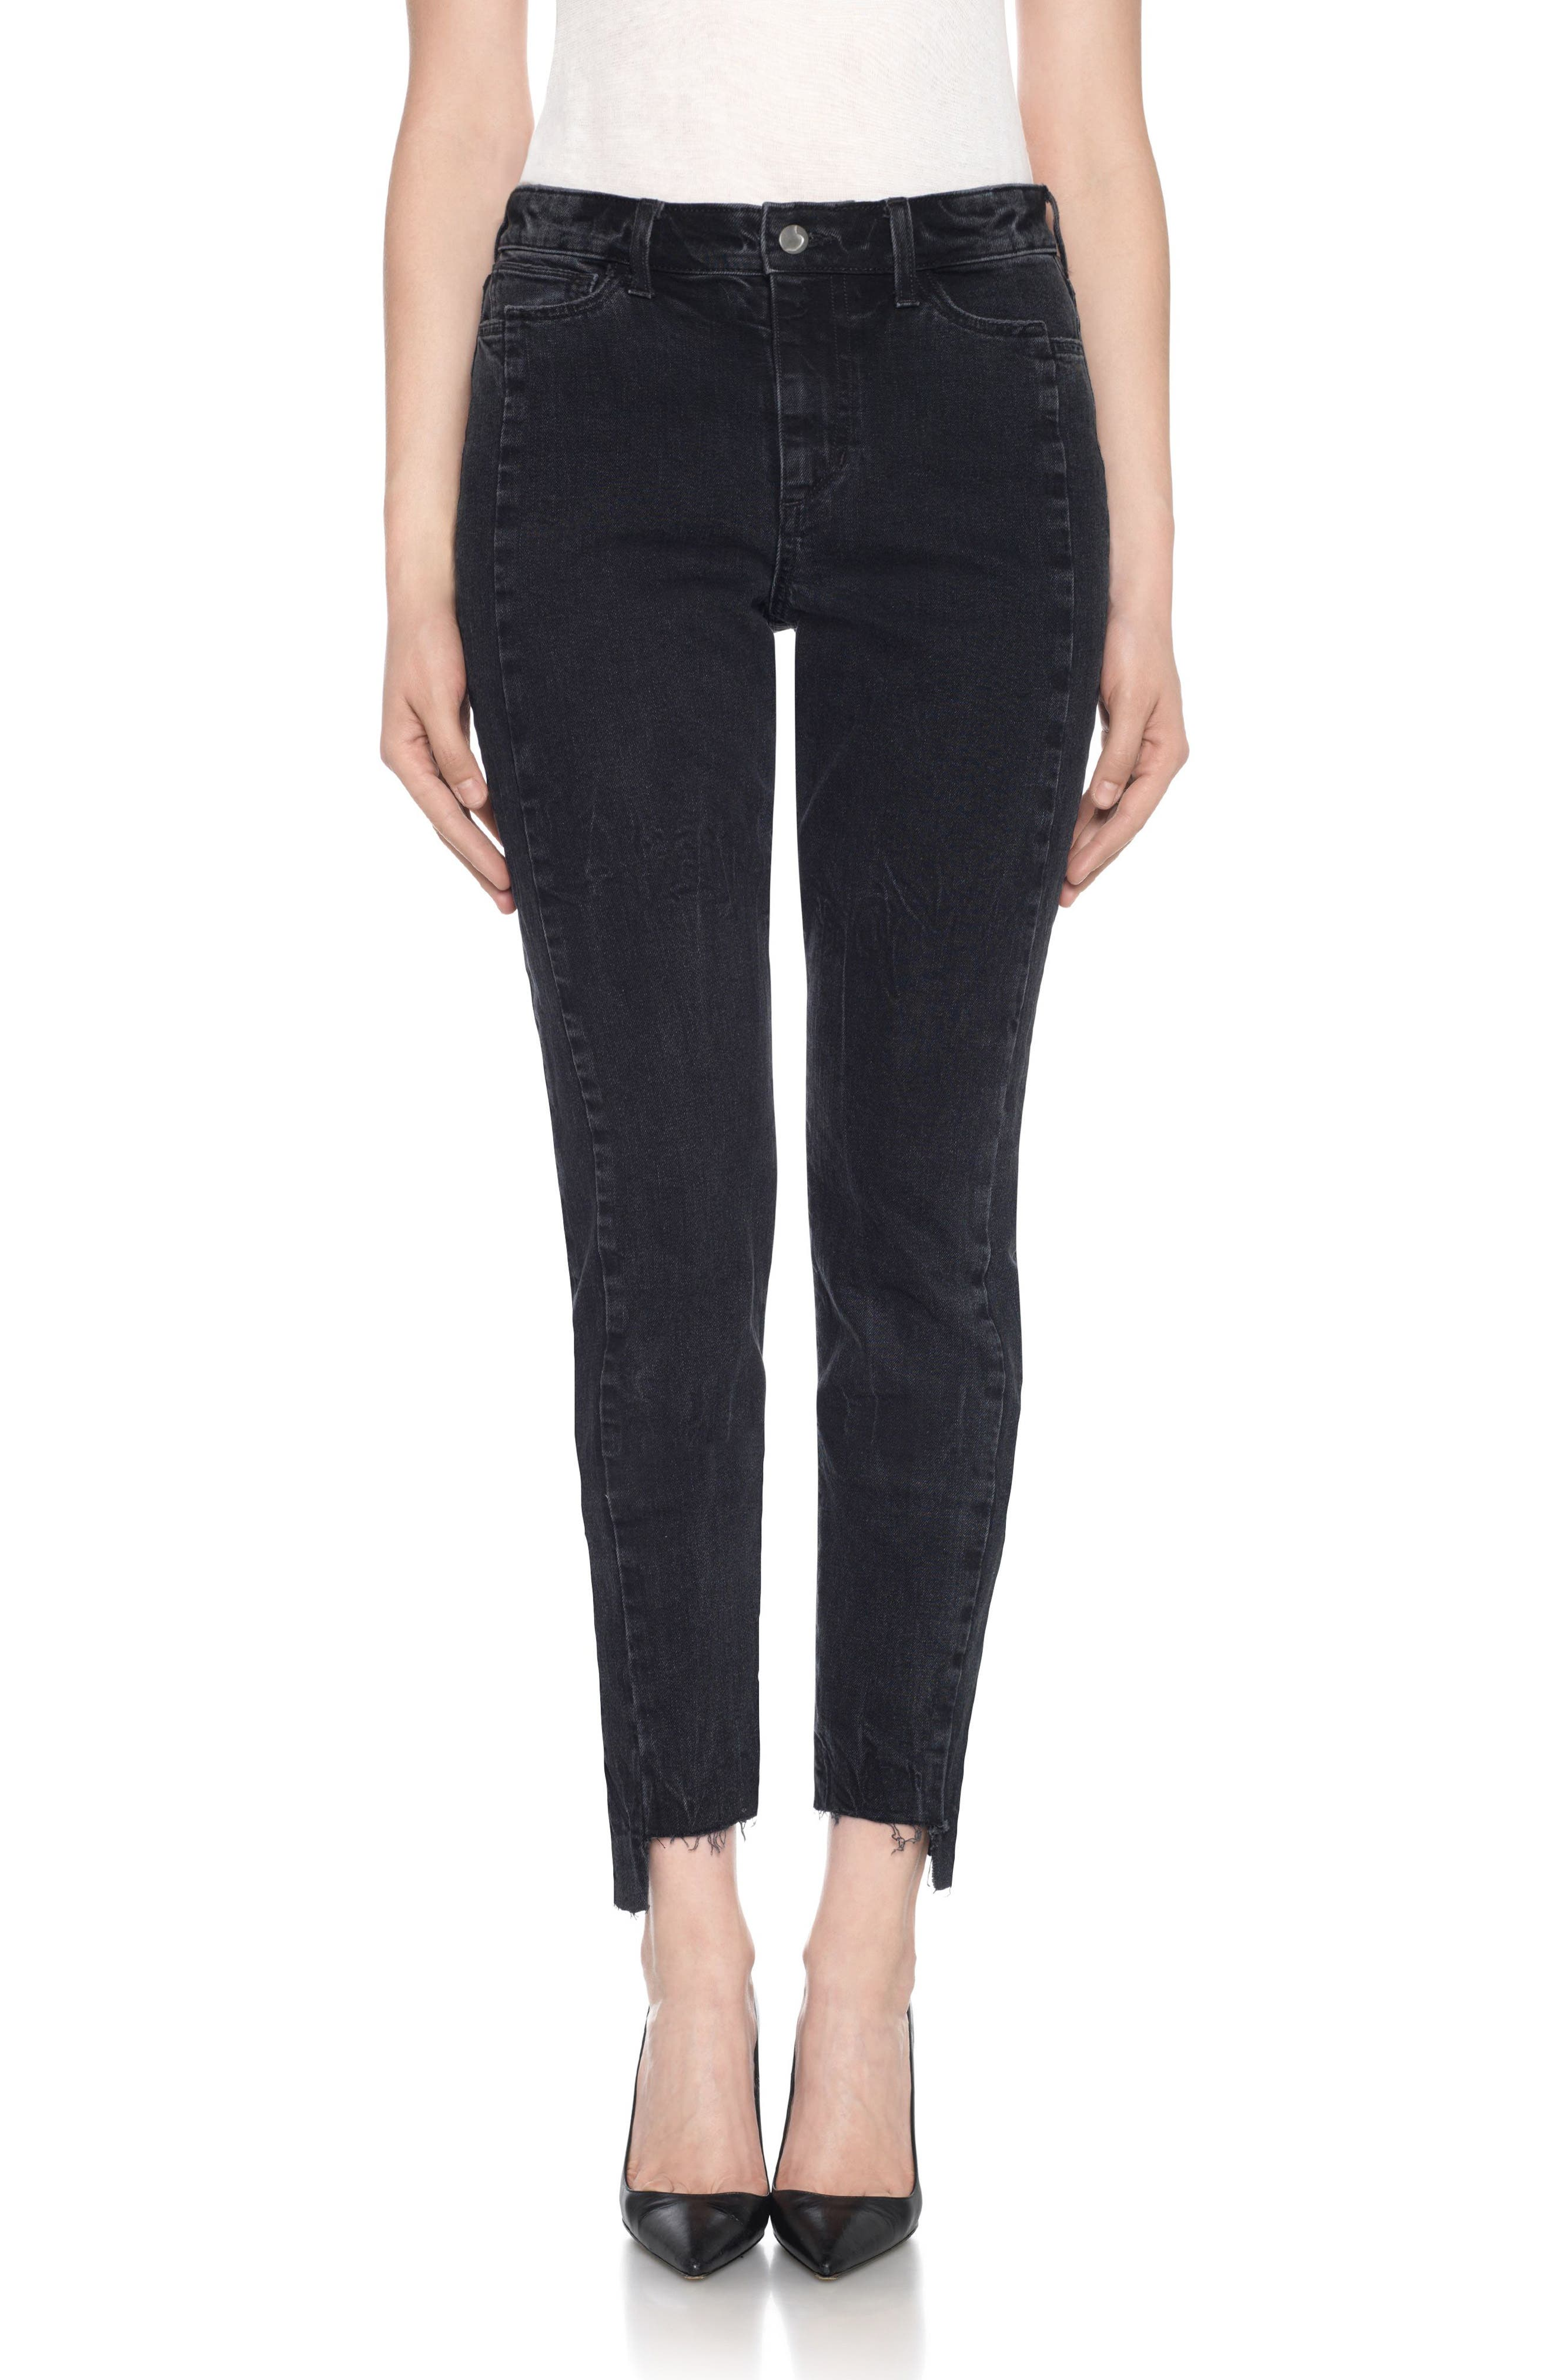 Main Image - Taylor Hill x Joe's Kass Raw Step Hem Ankle Skinny Jeans (Domino)